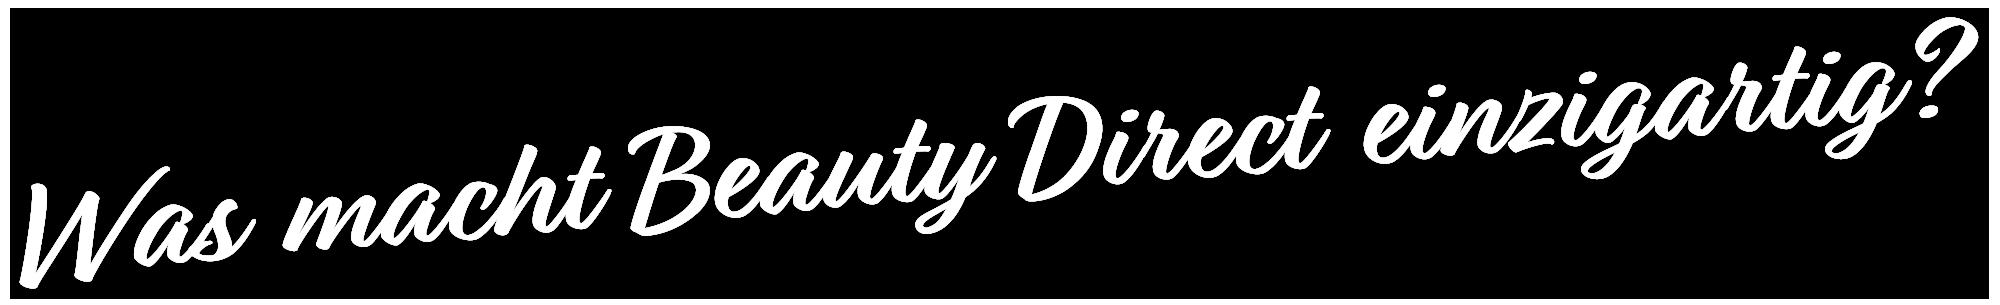 Was macht Beauty Direct einzigartig?